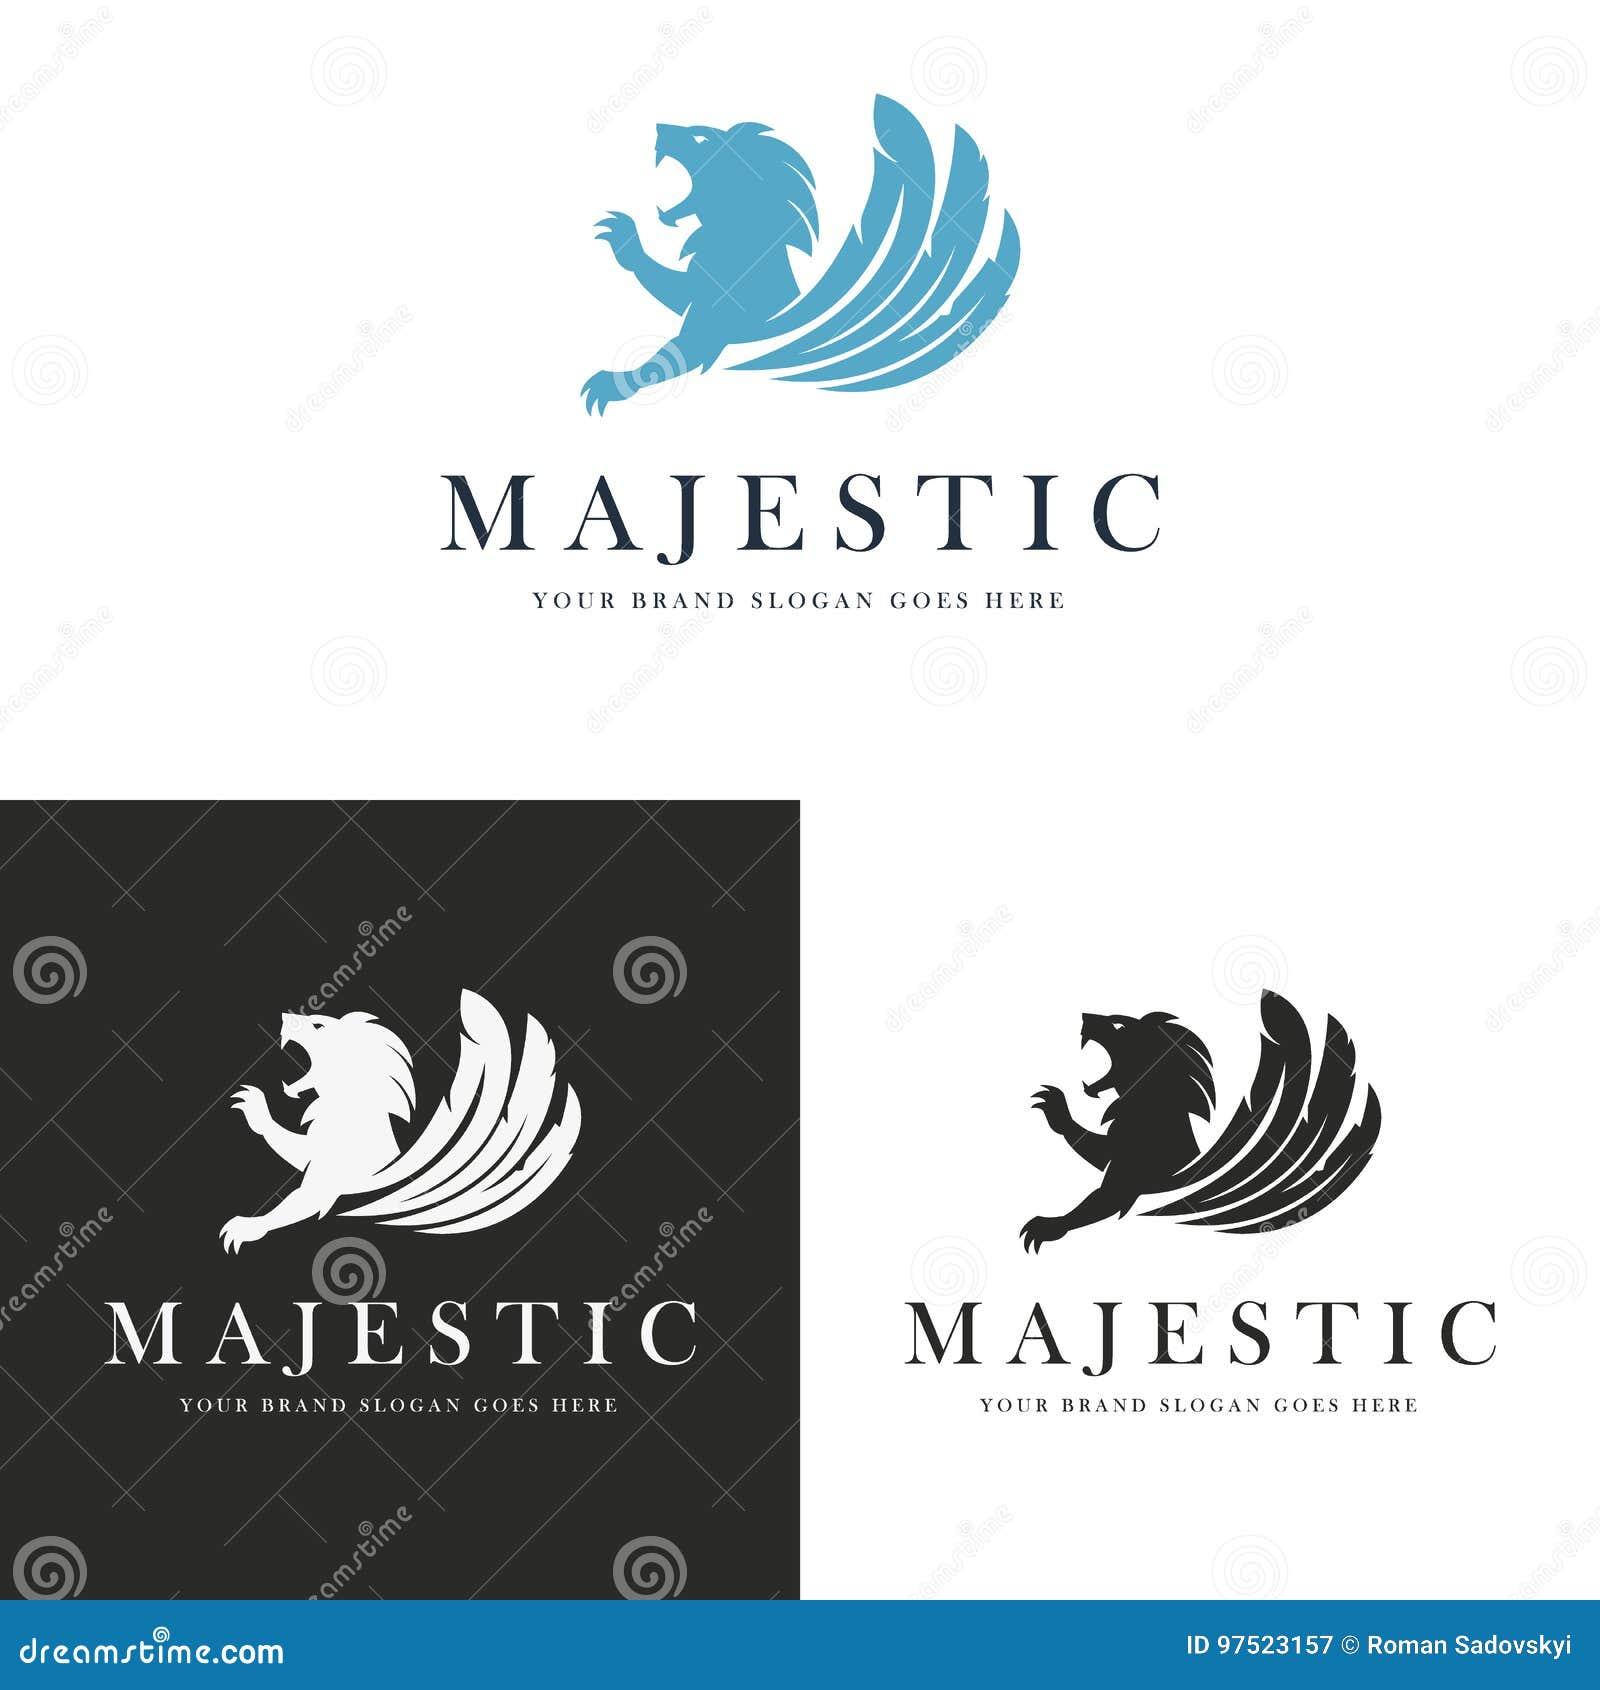 Majestic Lion Logo Stock Vector. Illustration Of Brand